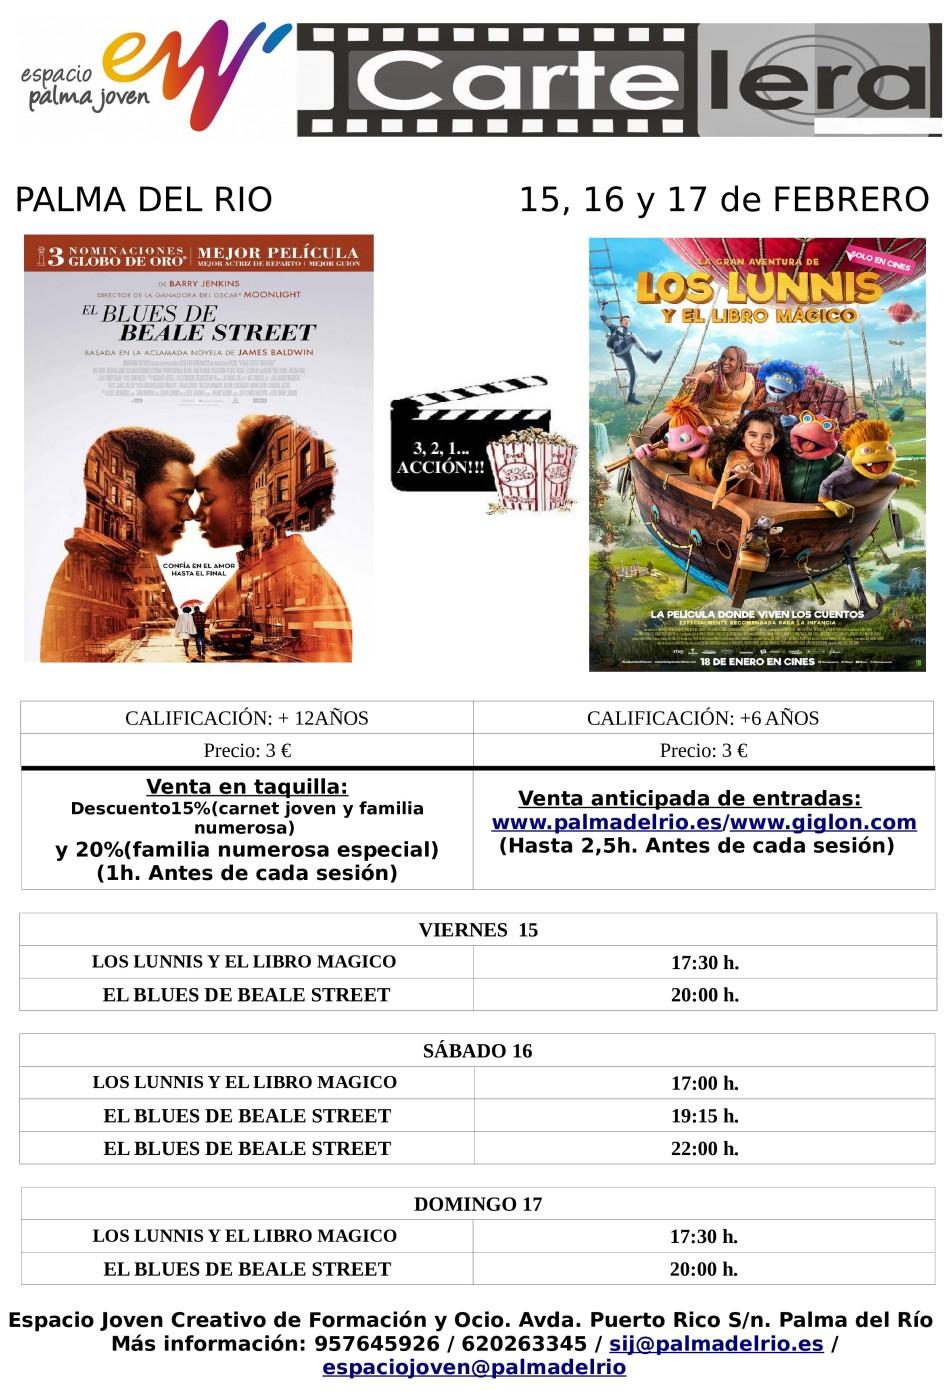 https://www.palmadelrio.es/sites/default/files/cine_15.16.17_febrero_2019.jpg